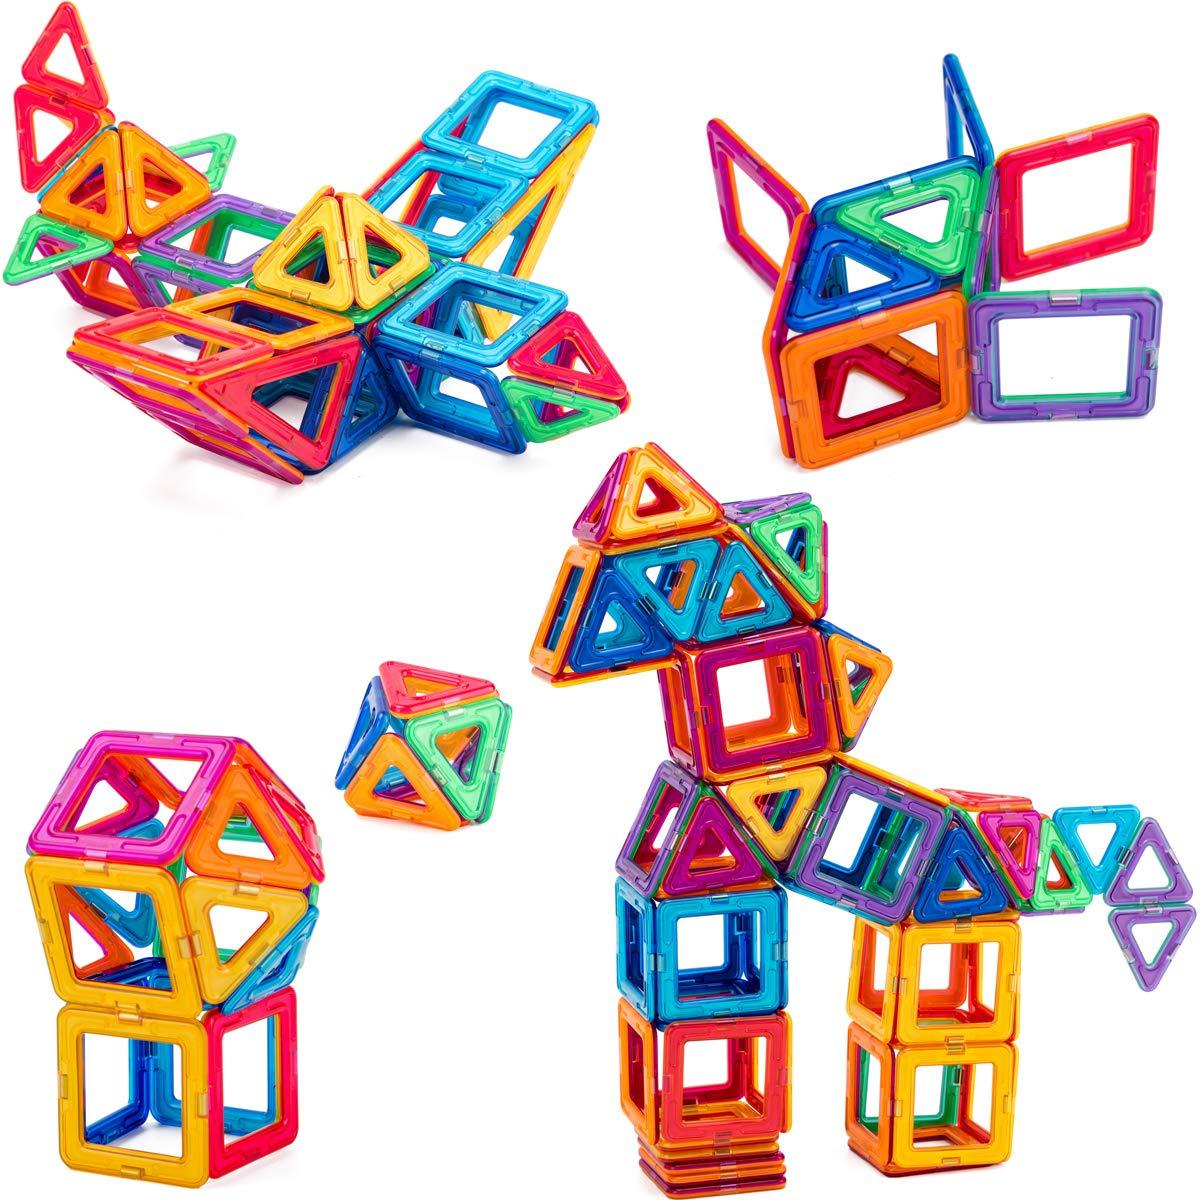 COSSY Magnet Tiles Building Block 45 PCs, Magnetic Stick ...